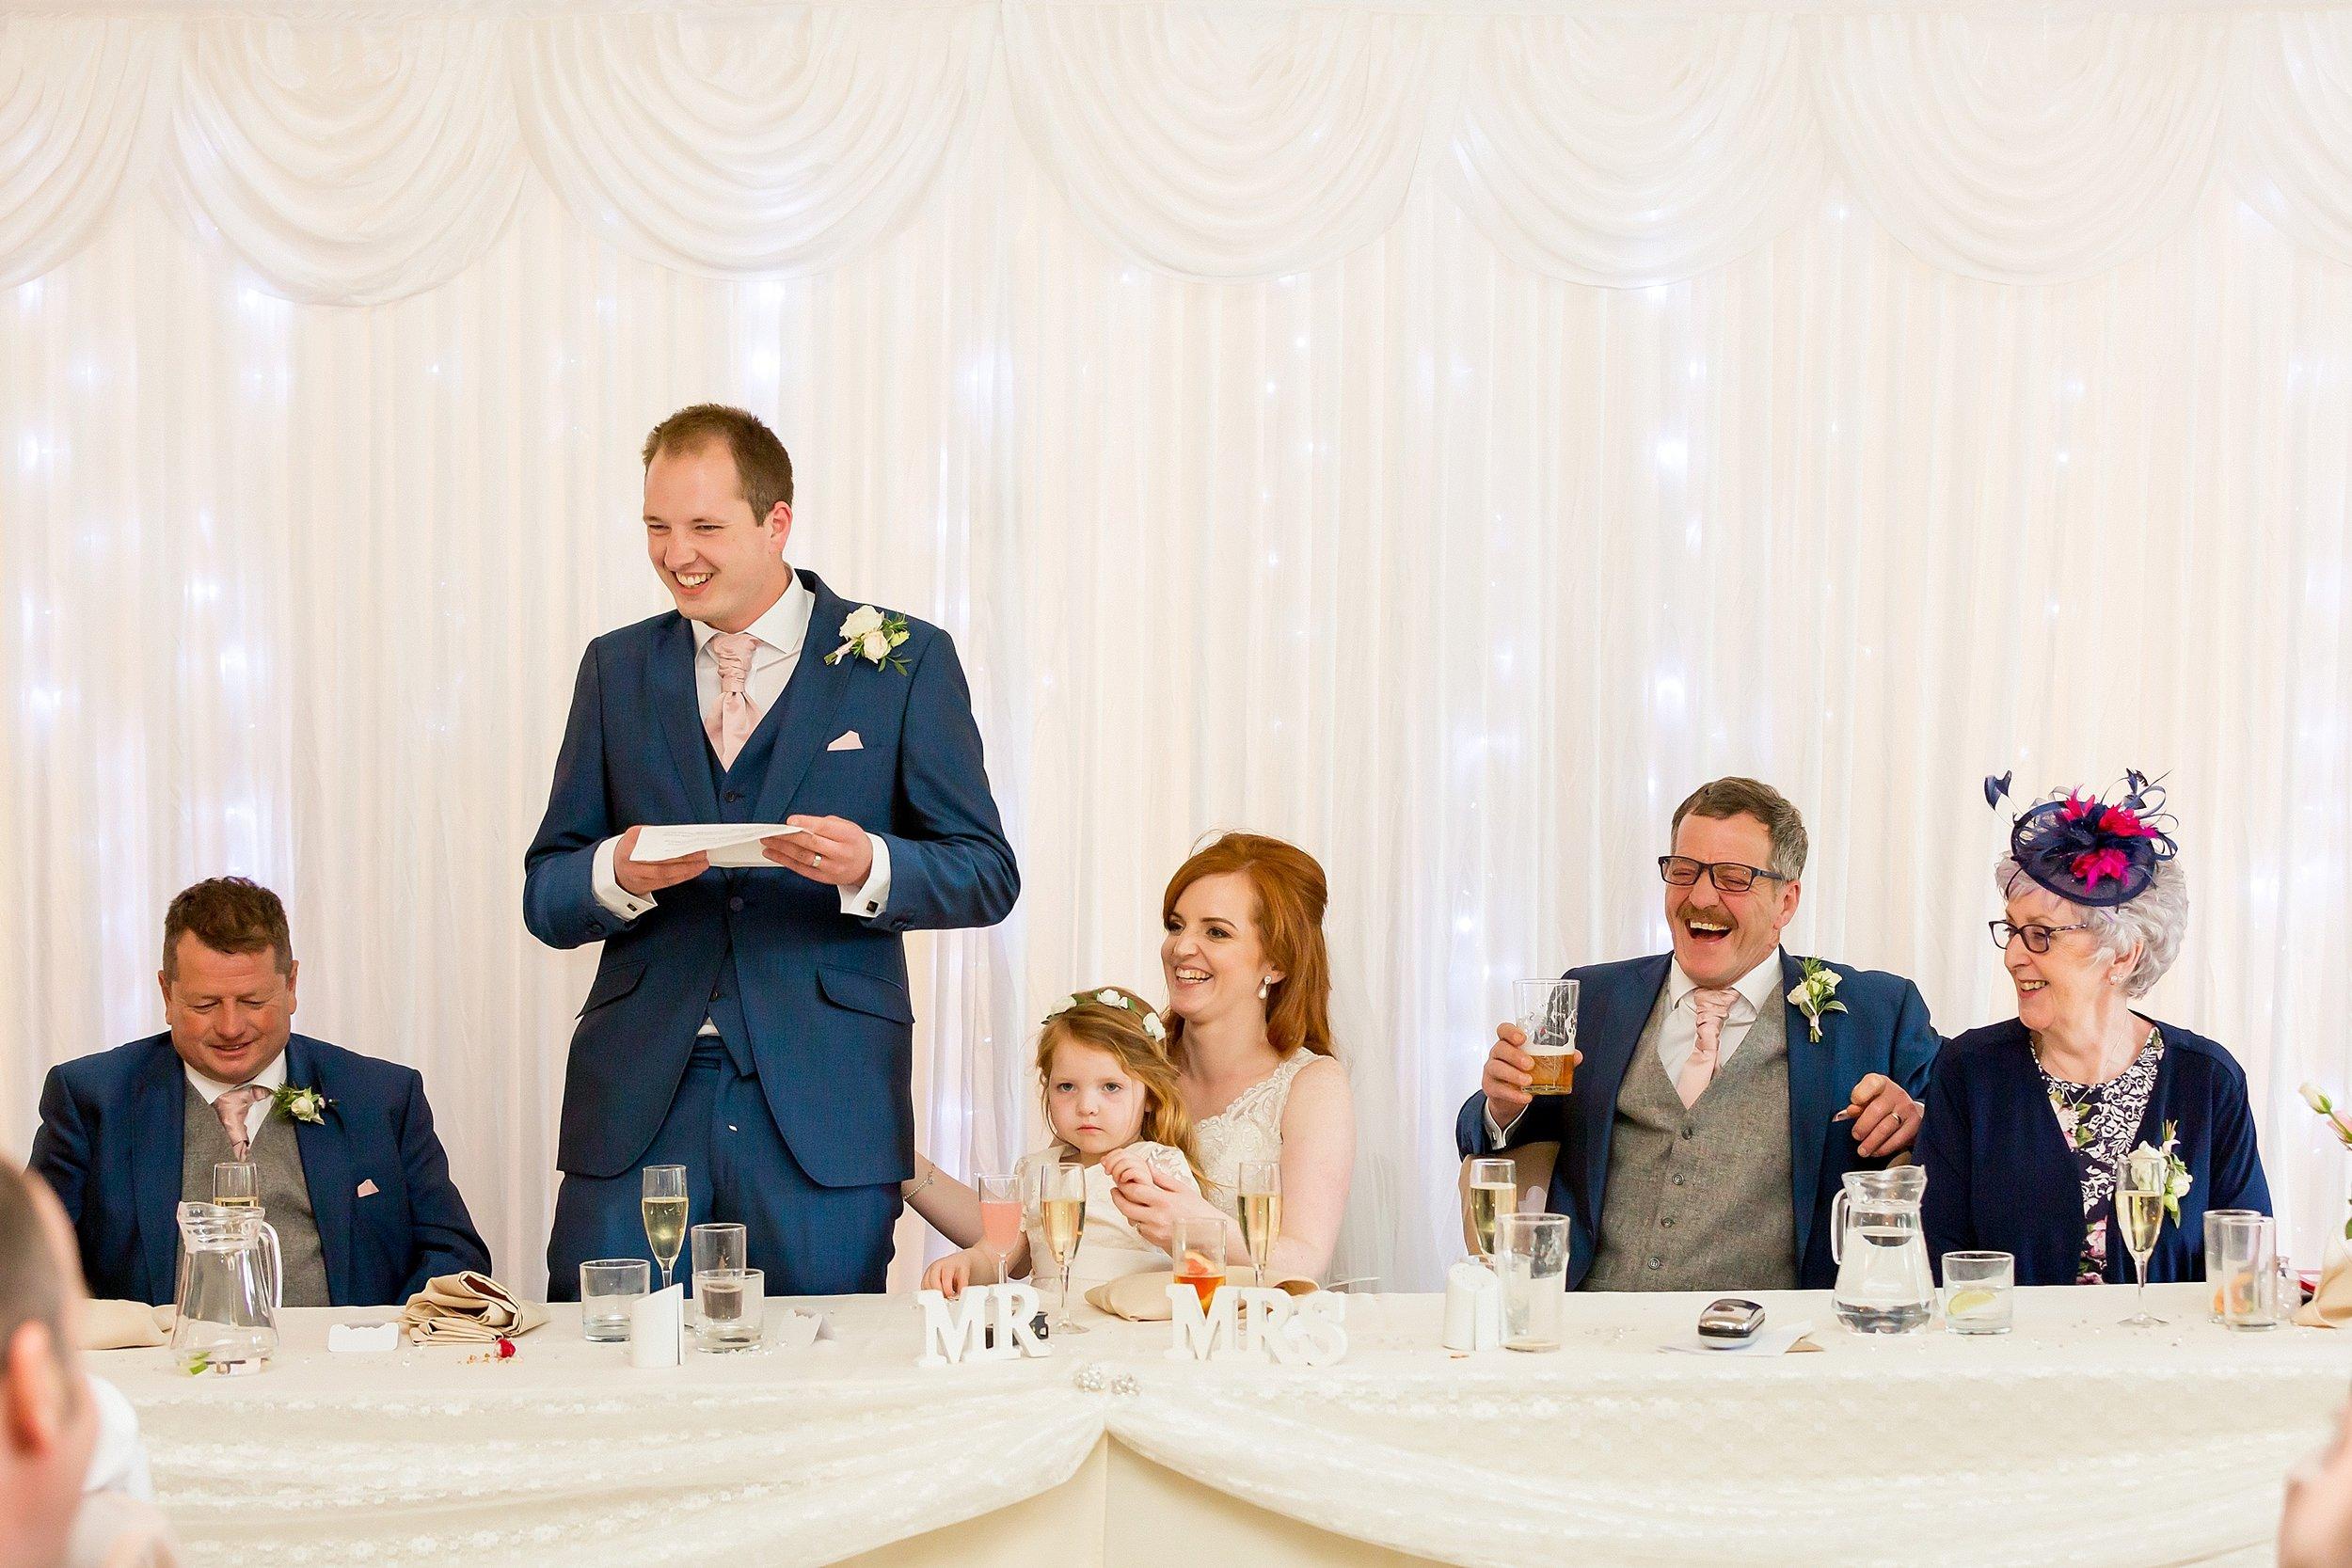 wedding reception at woodlands castle.jpg